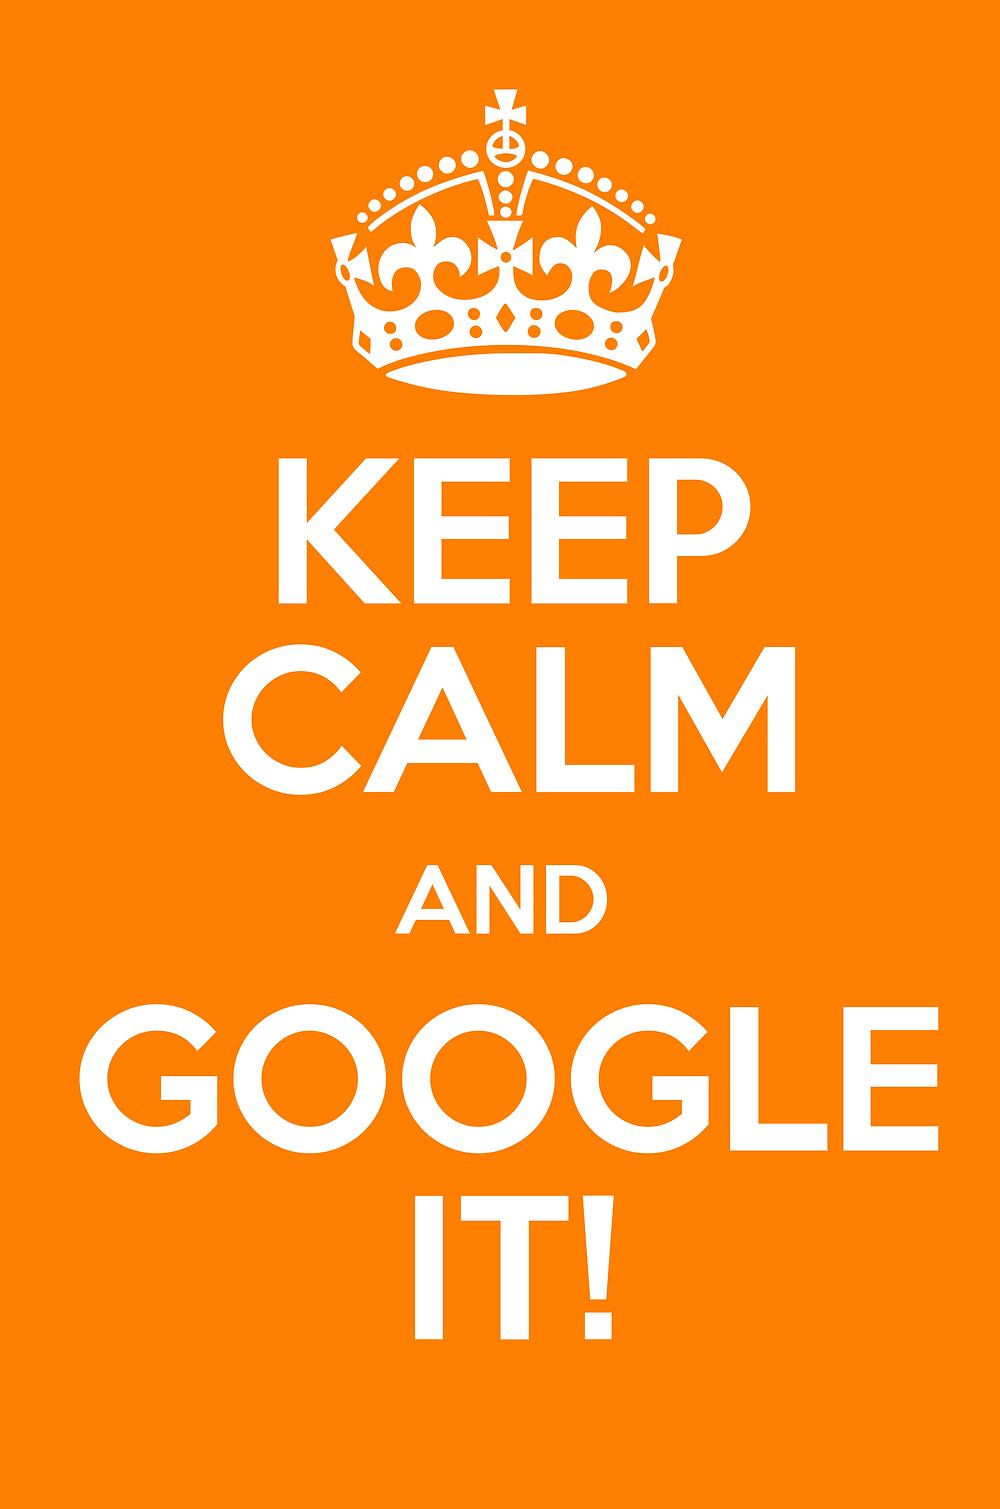 Keep calm and Google it